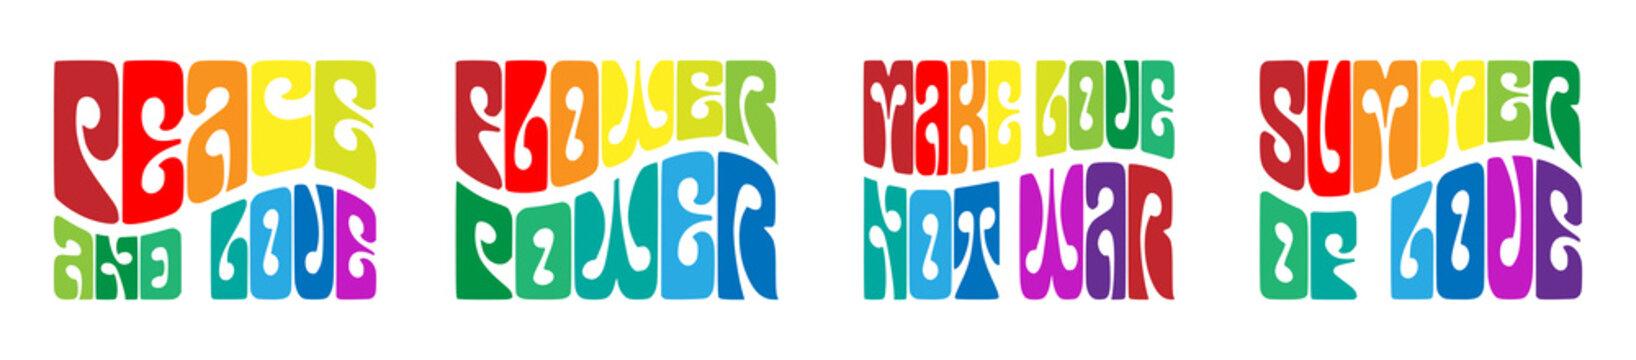 Beat generation slogans typography on white background